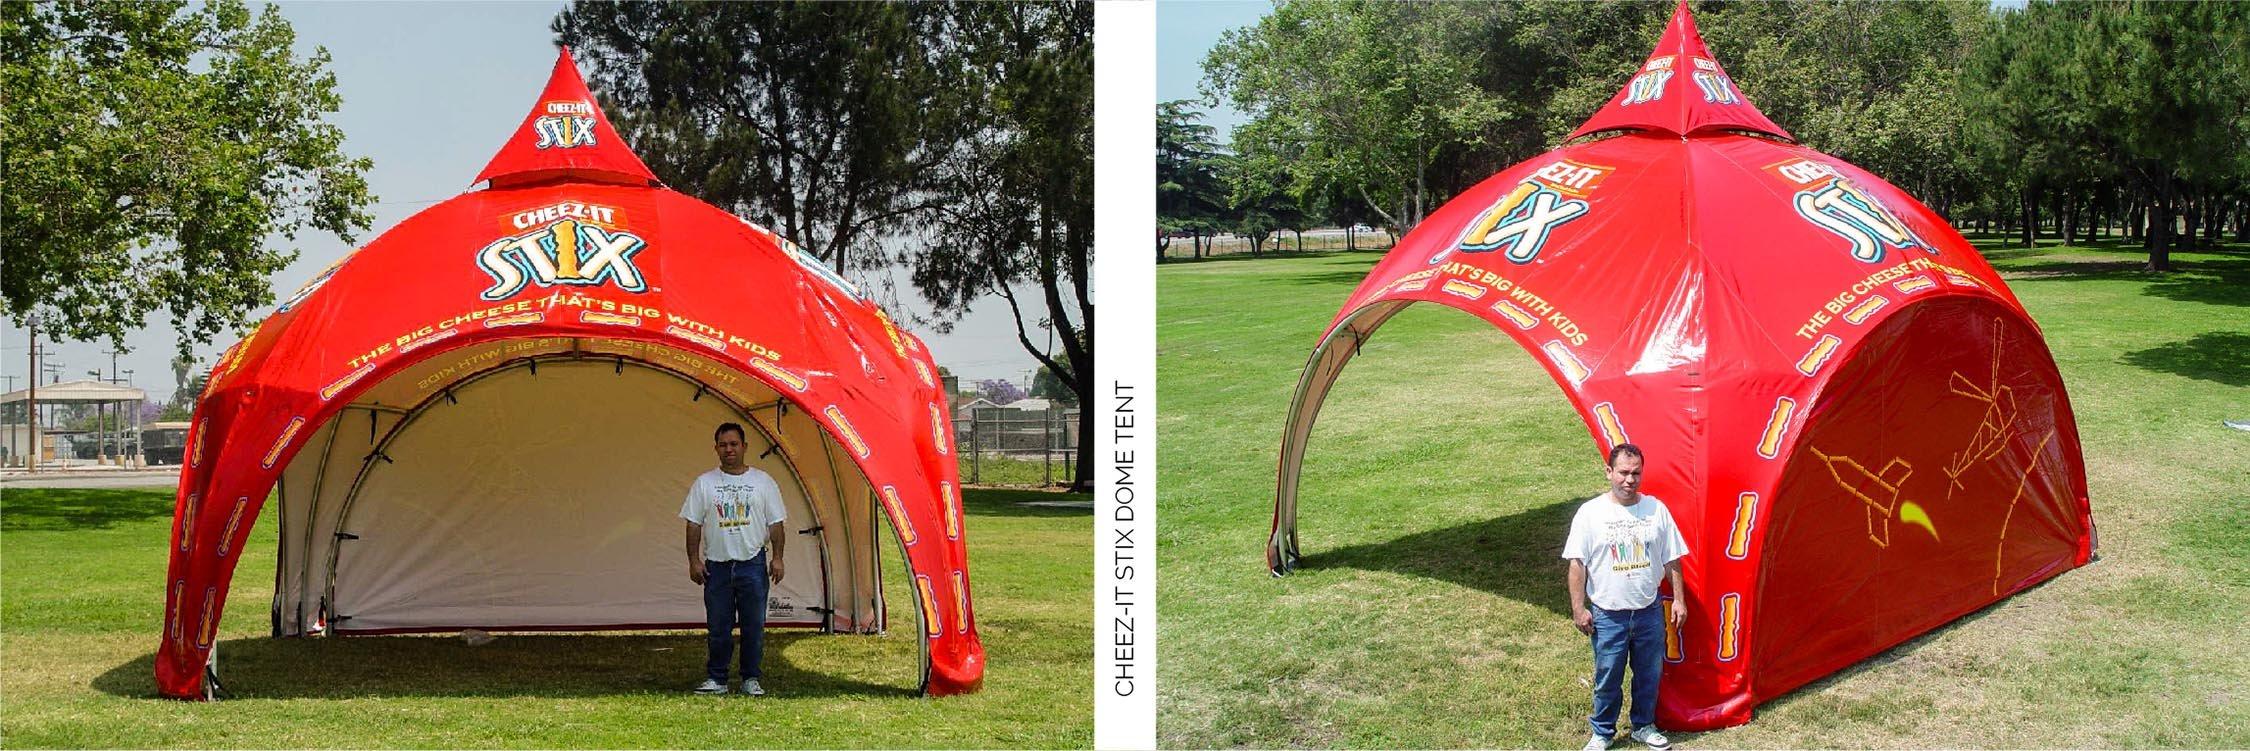 cheez-it-dome-tent-header.jpg